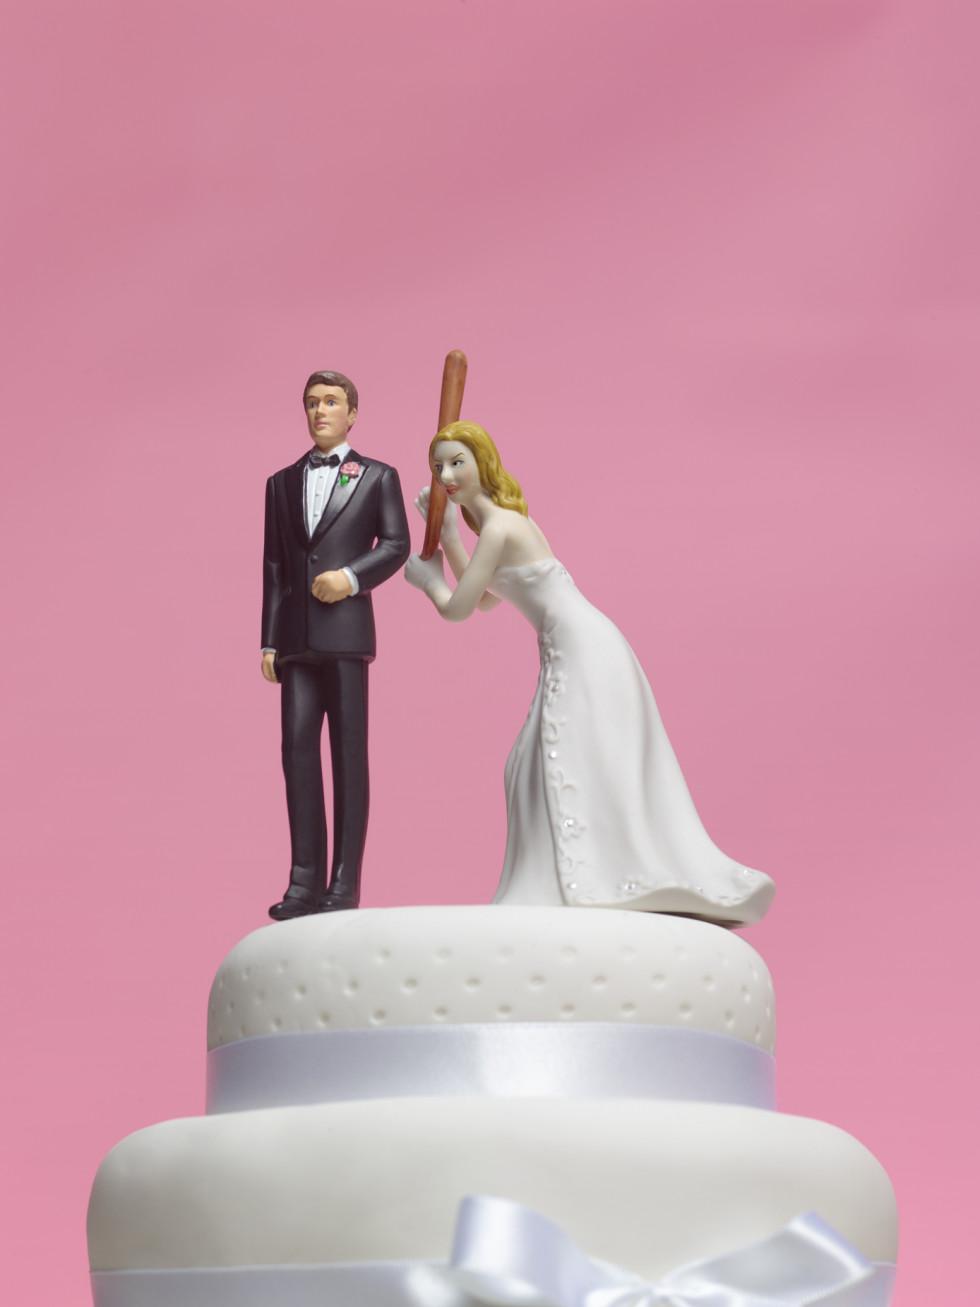 Wedding cake topper bride baseball bat funny divorce